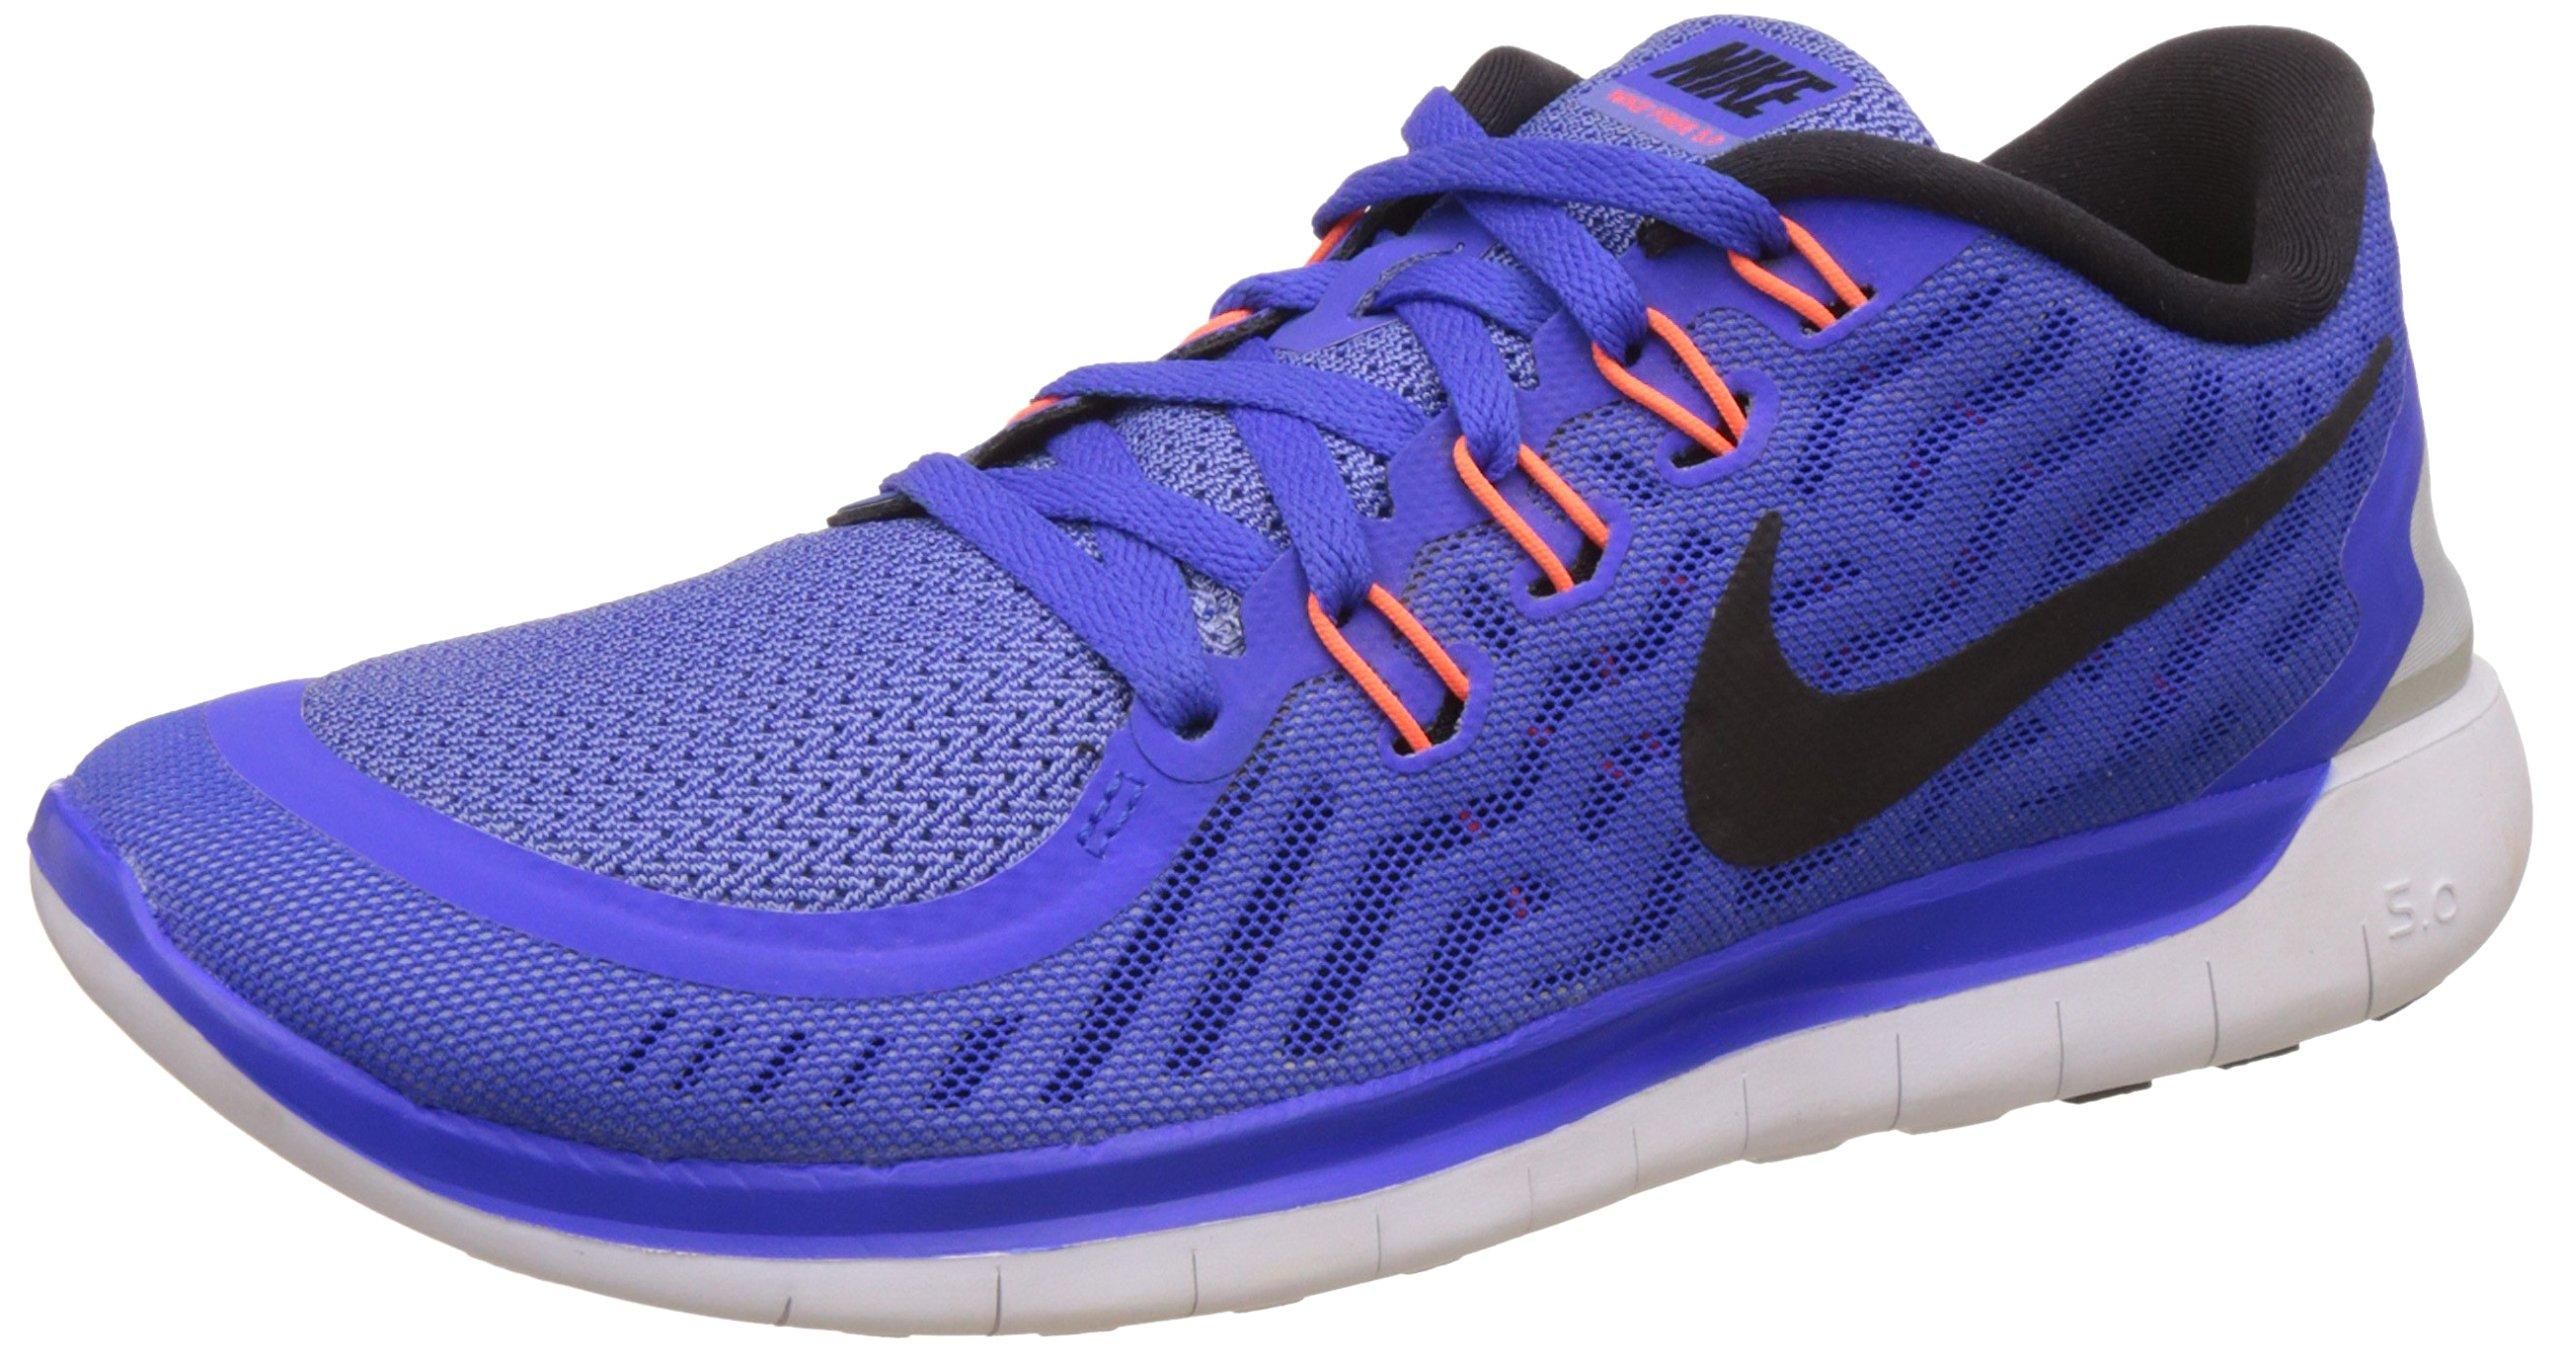 2ddcd1aebfb4 Galleon - Nike Womens Free 5.0 Racer Blue Black Chlk Blue White Running  Shoe 8 Women US